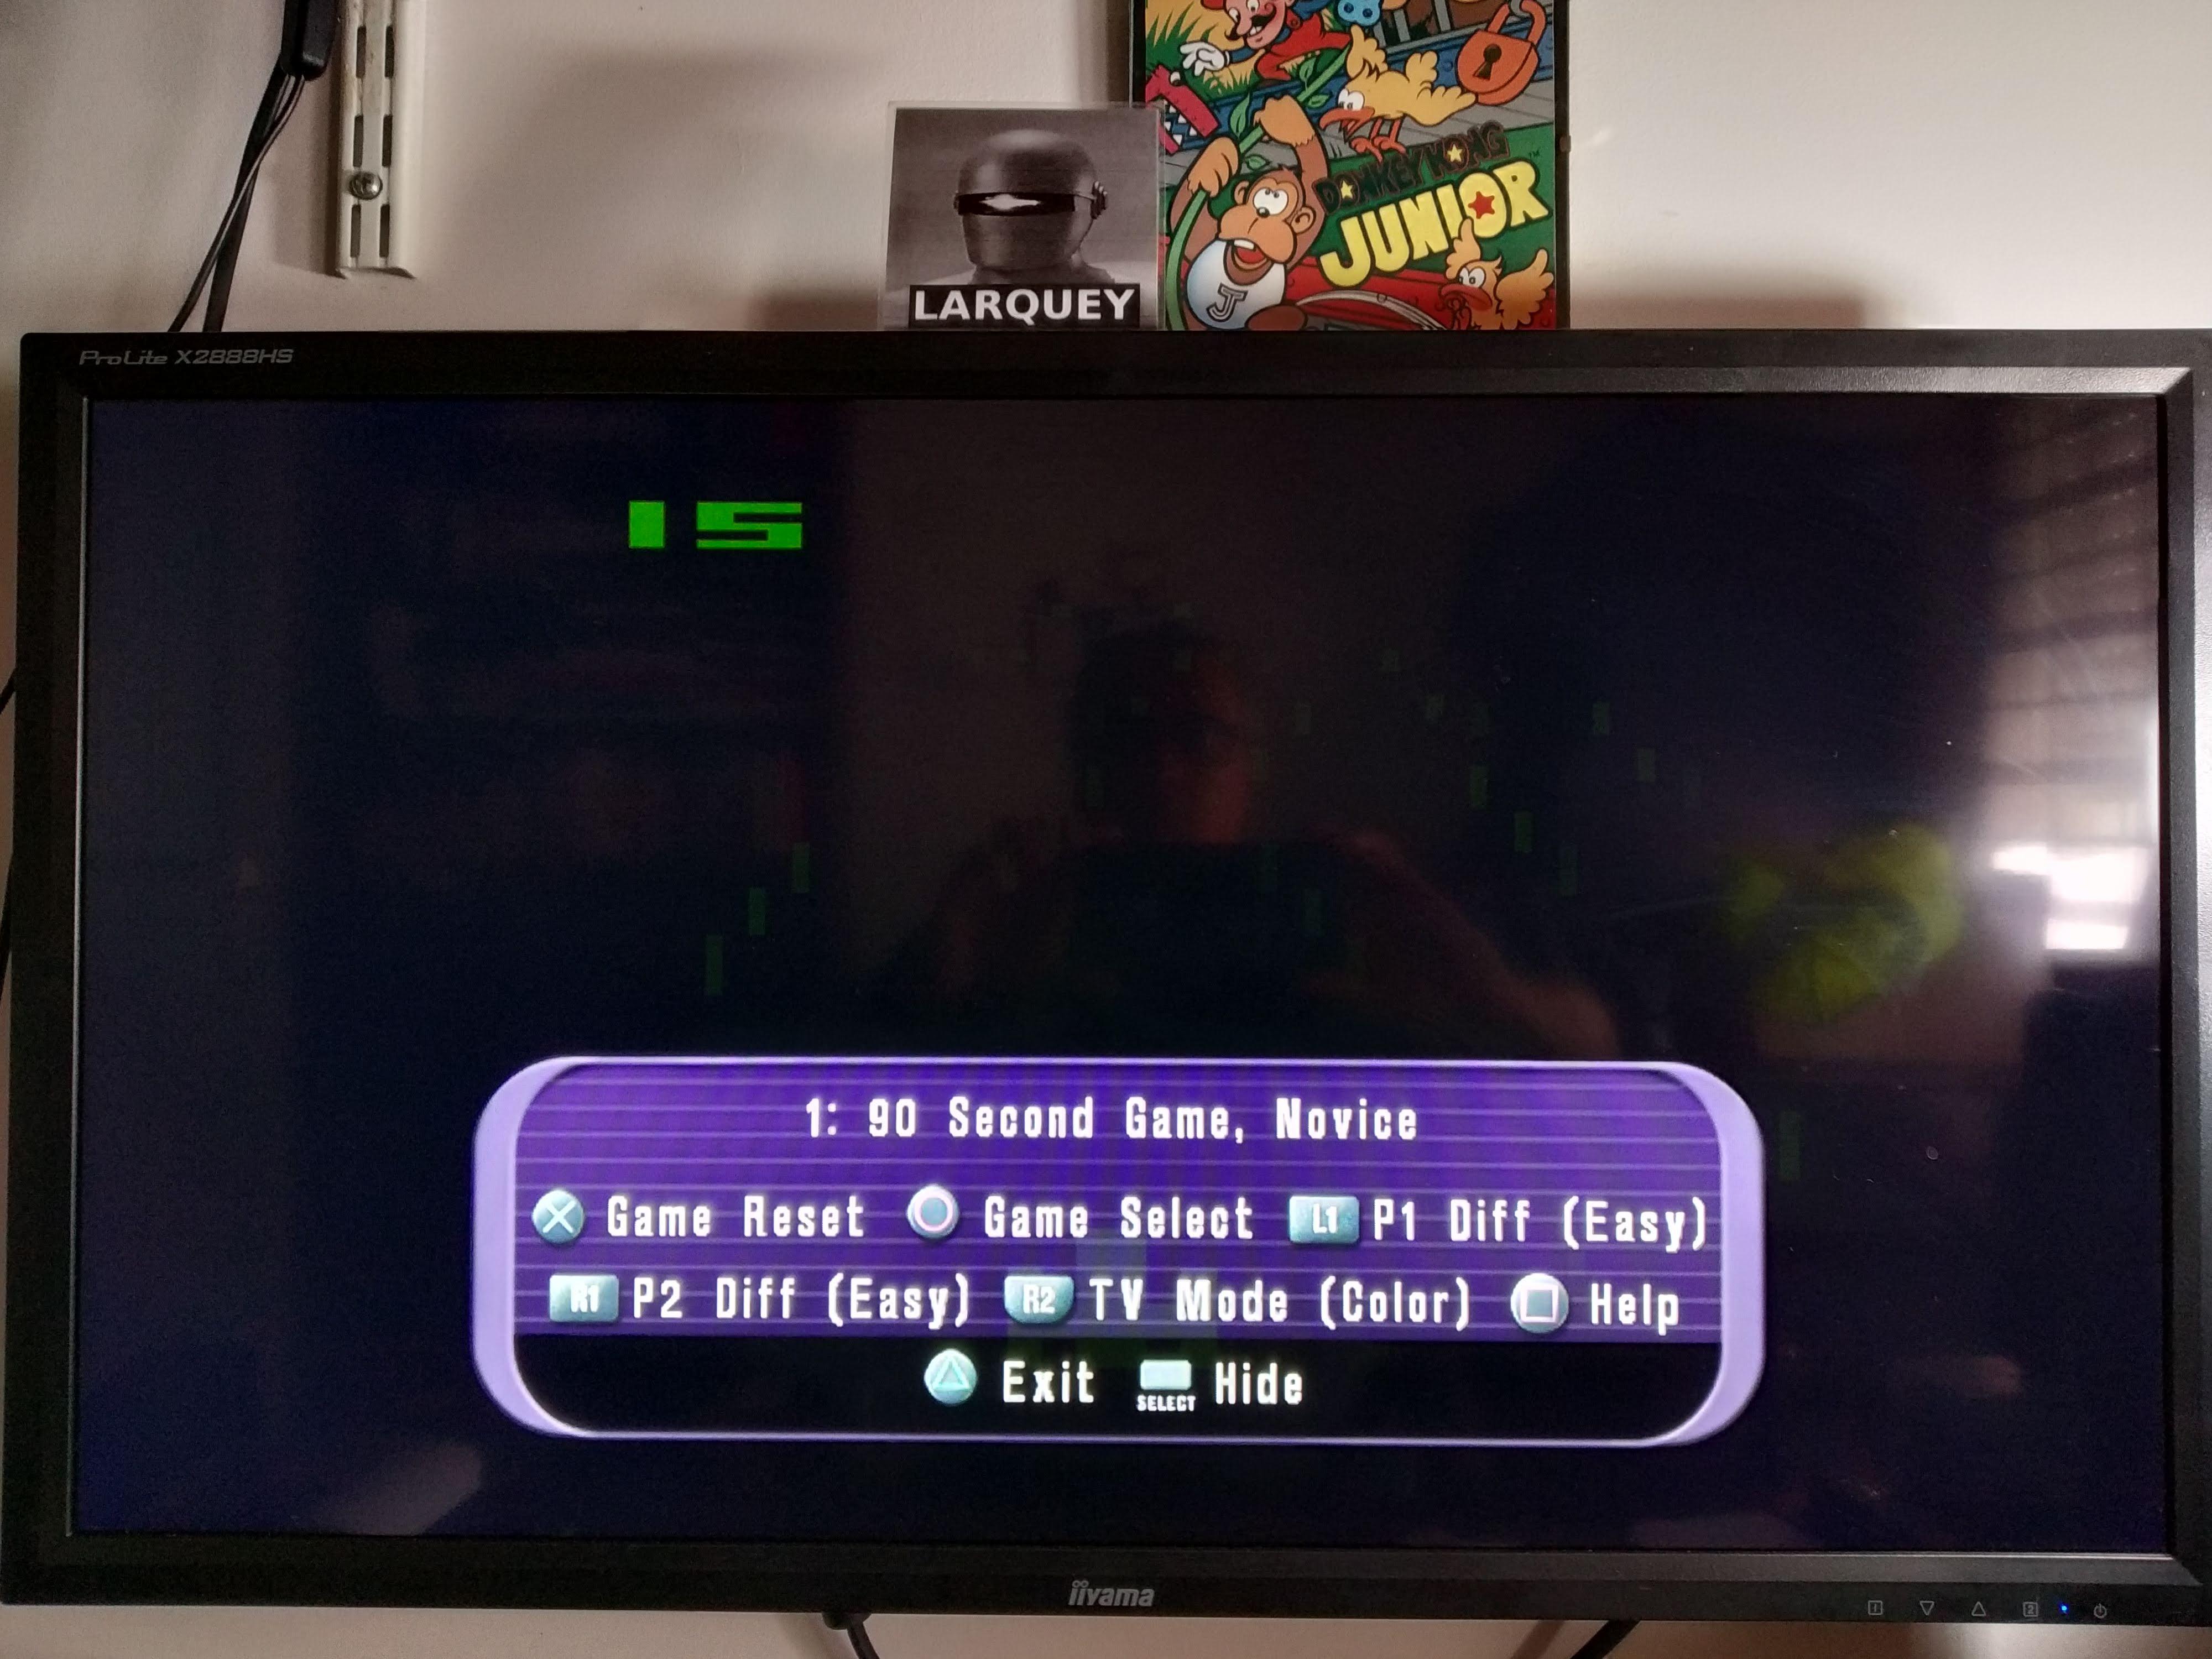 Larquey: Atari Anthology: Night Driver [Game 1B] (Playstation 2 Emulated) 15 points on 2020-08-04 11:37:20